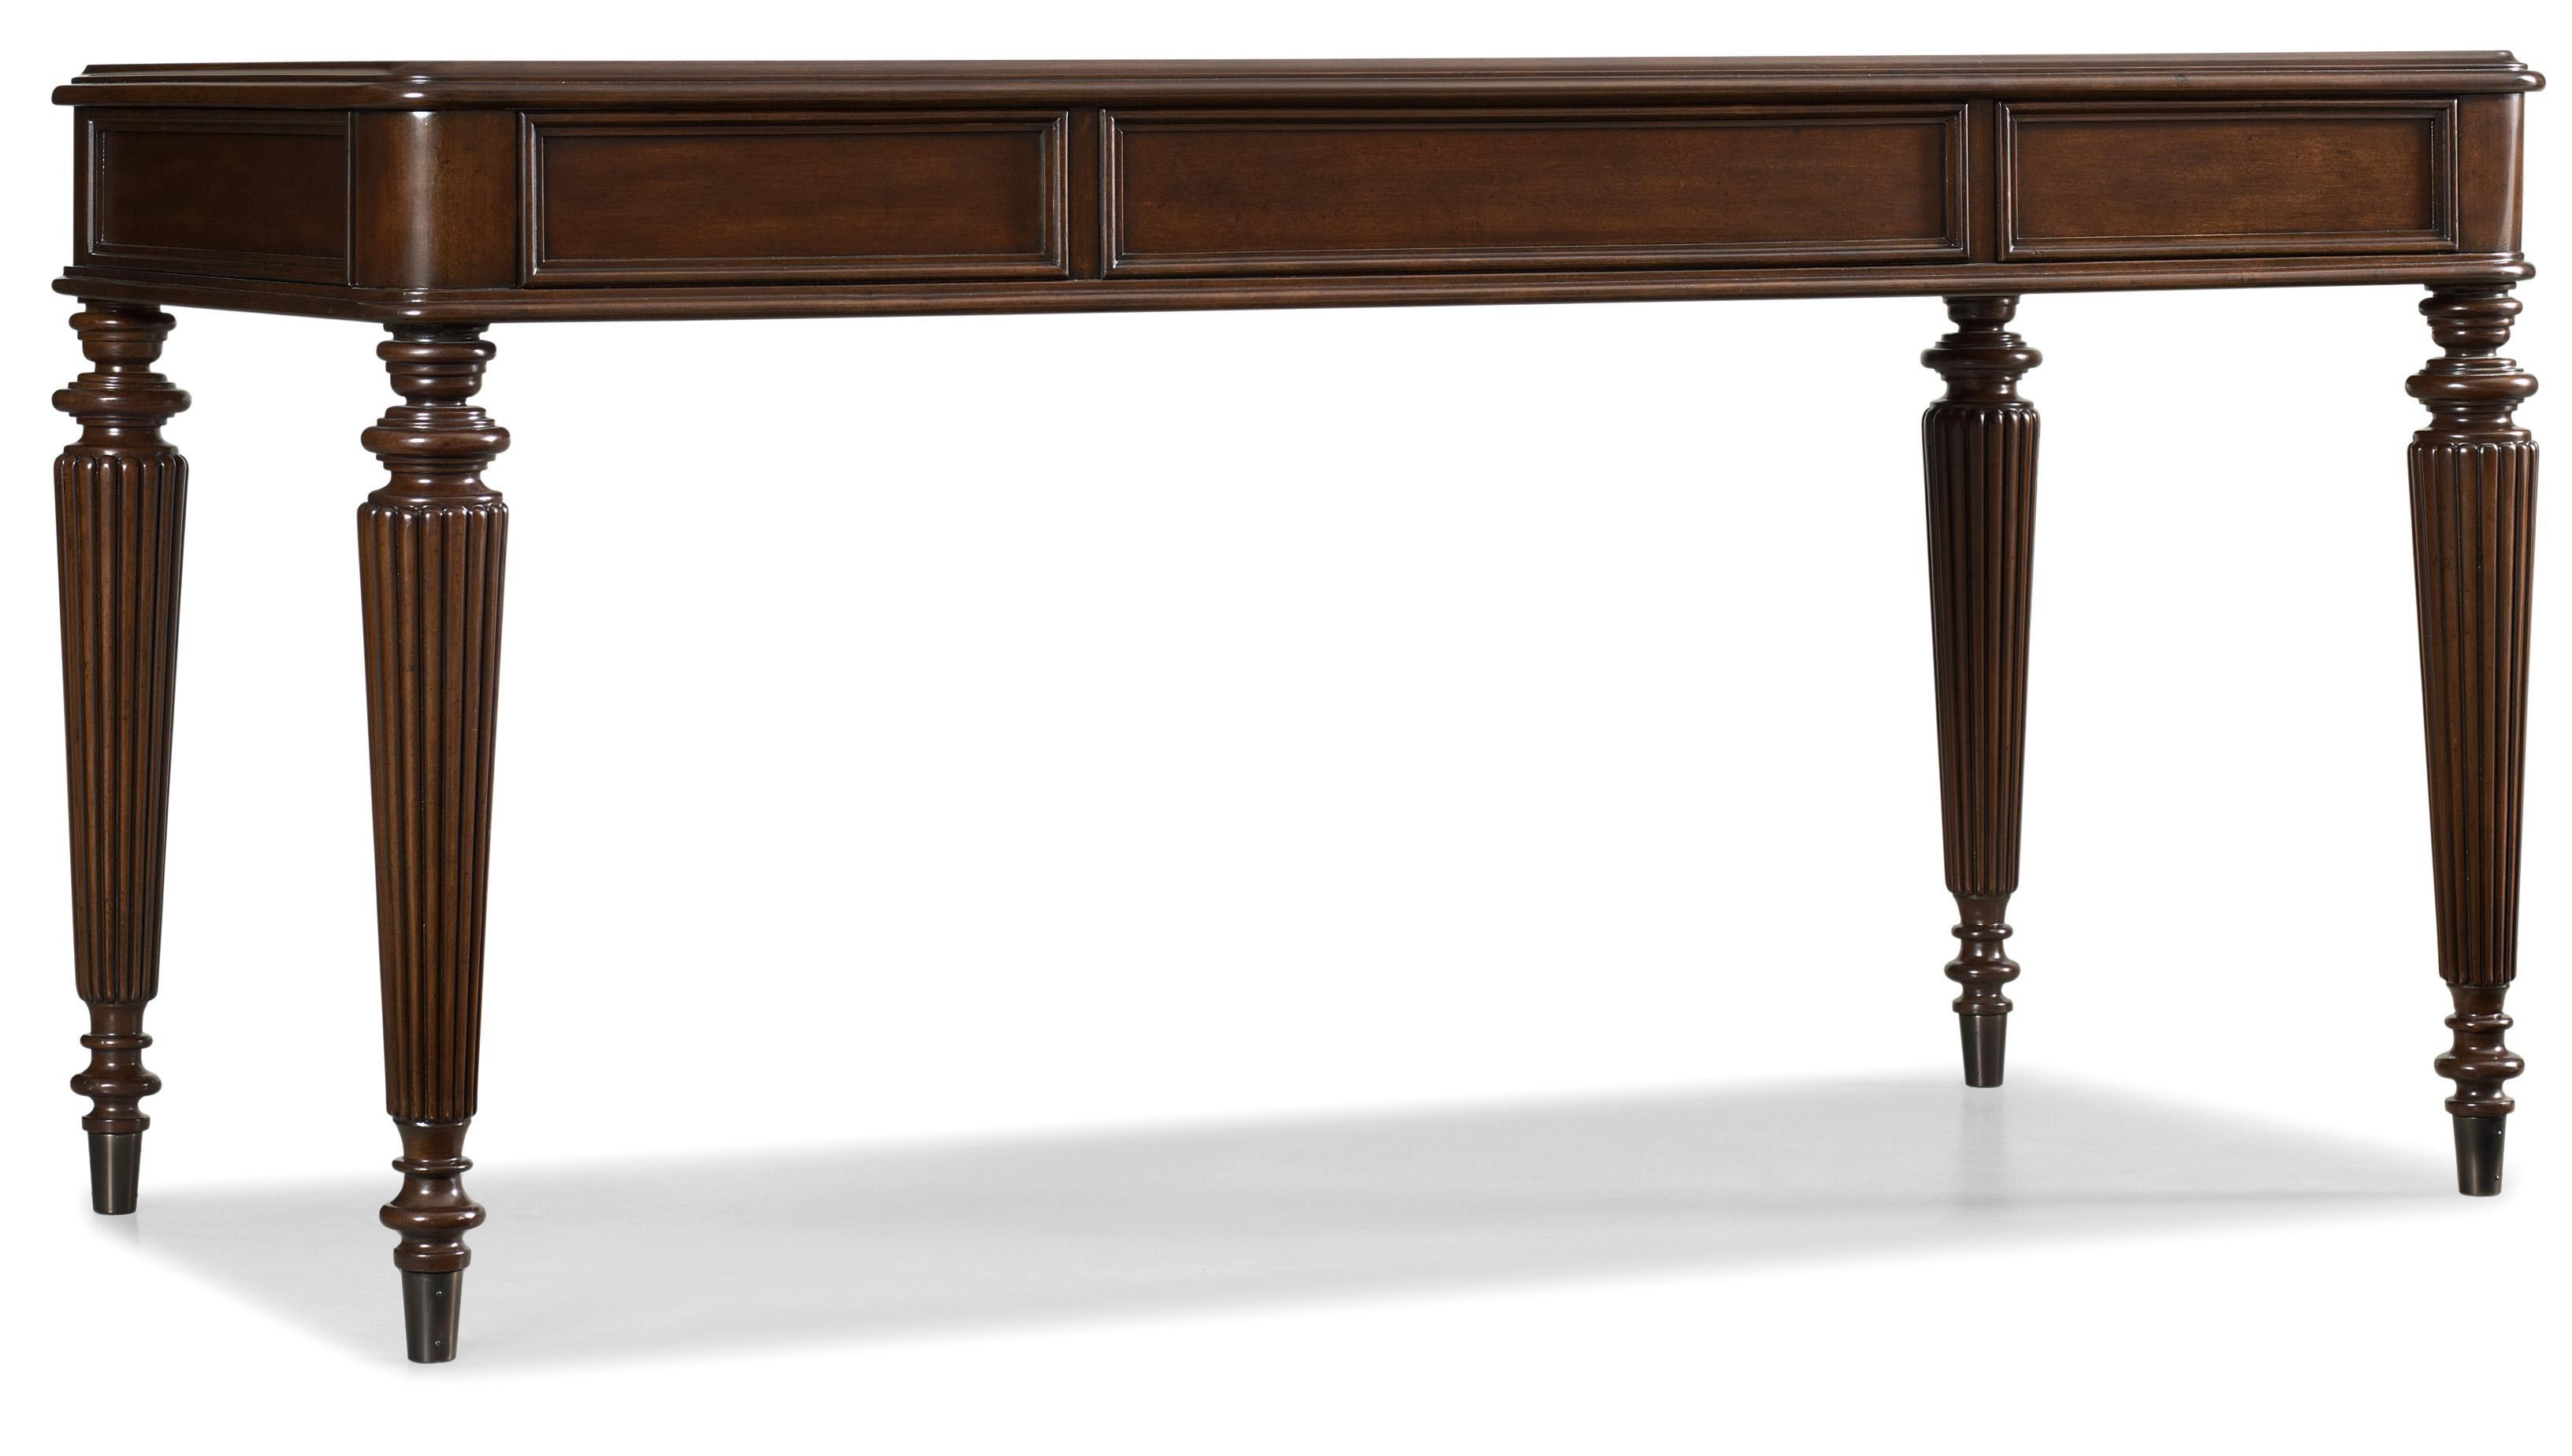 Home Office Leg Desk by Hooker Furniture at Suburban Furniture